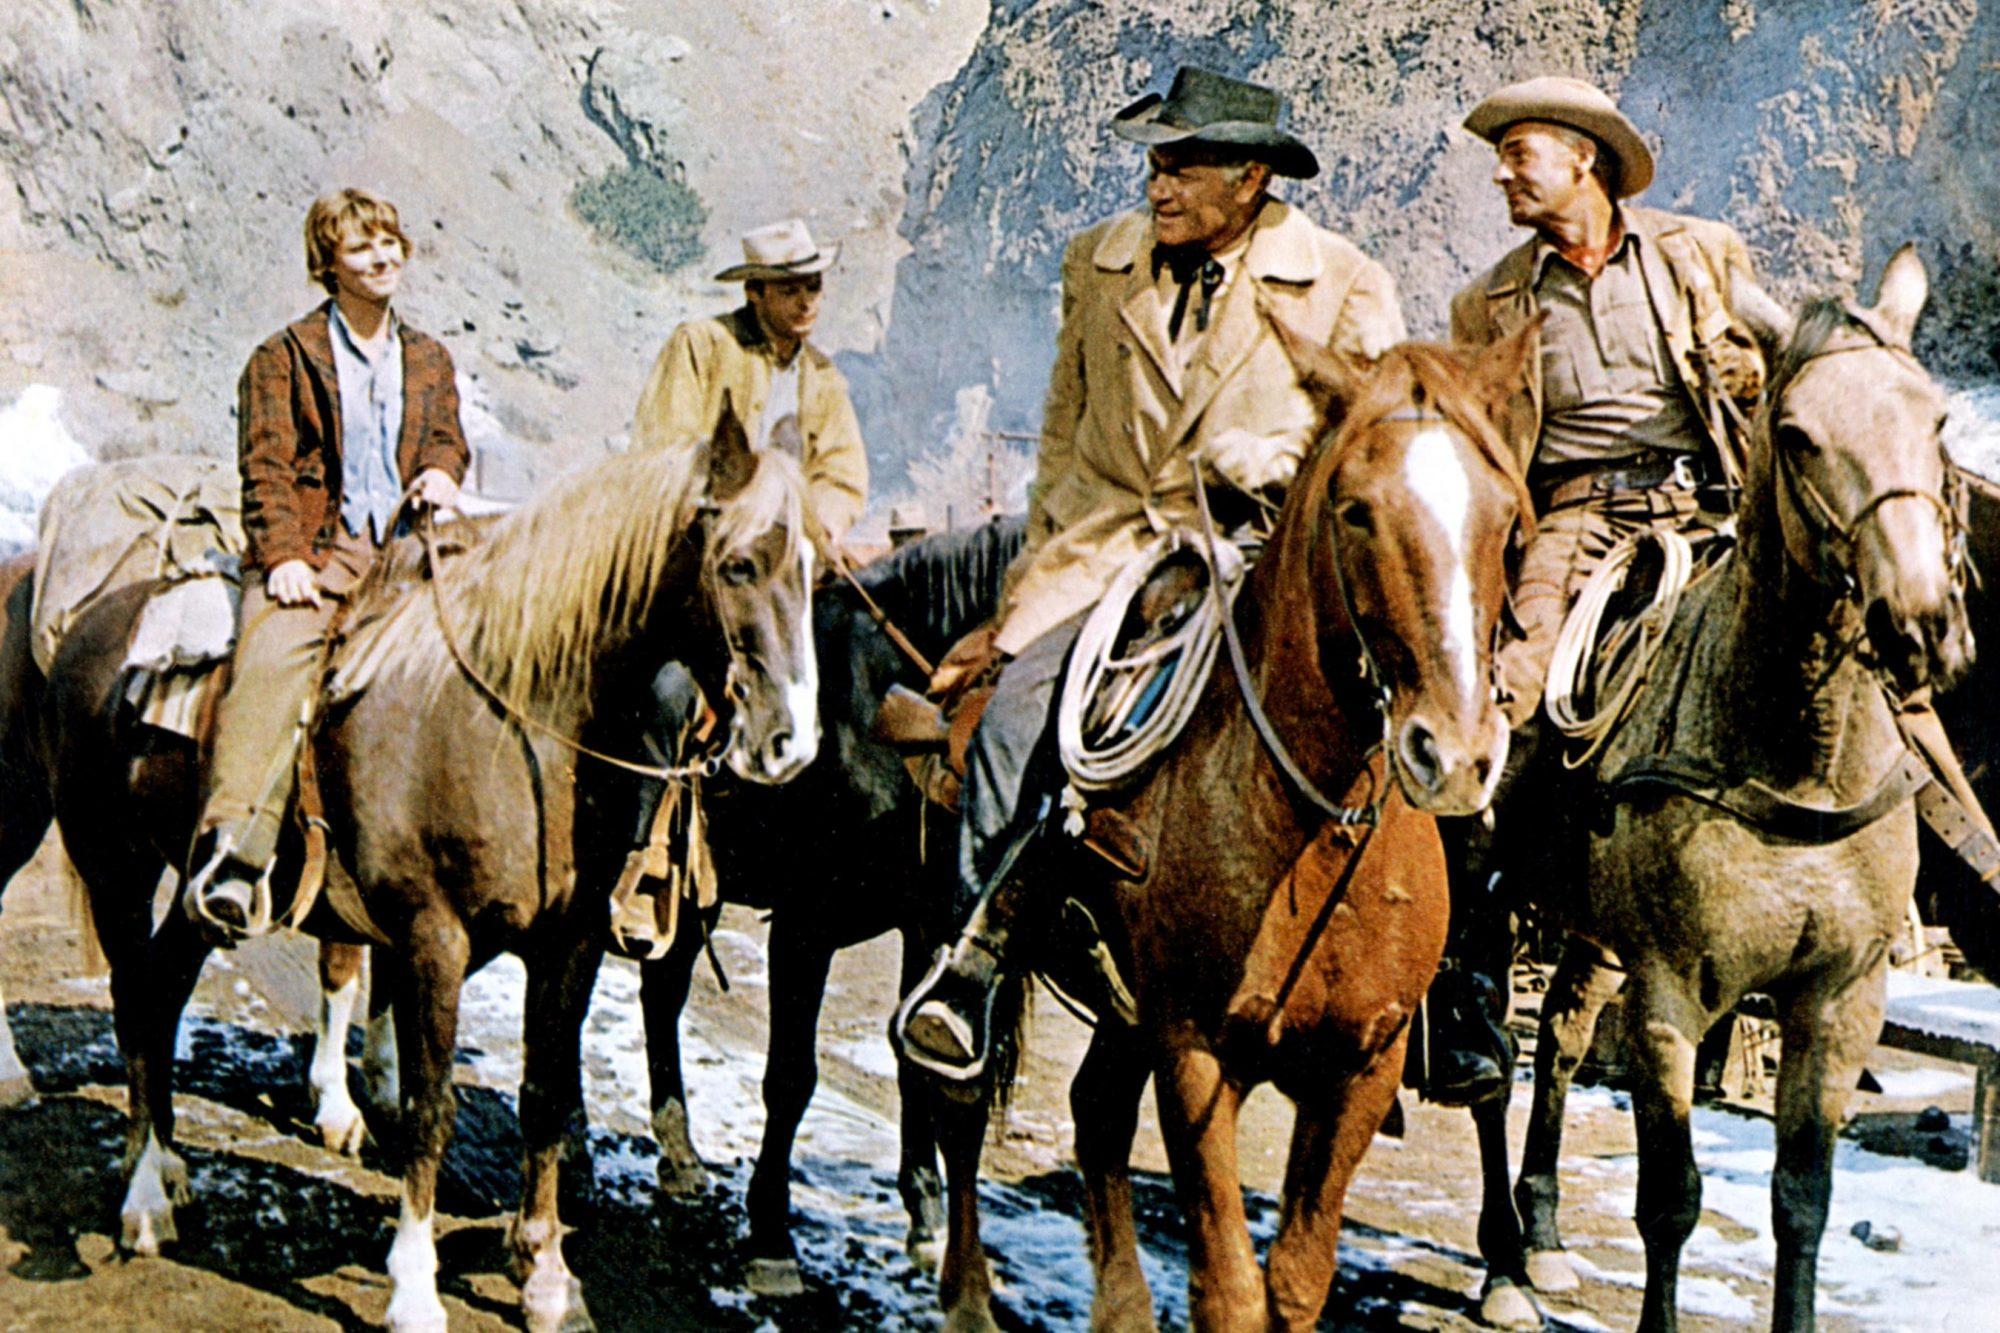 RIDE THE HIGH COUNTRY, Mariette Hartley, Ron Starr, Joel McCrea, Randolph Scott, 1962